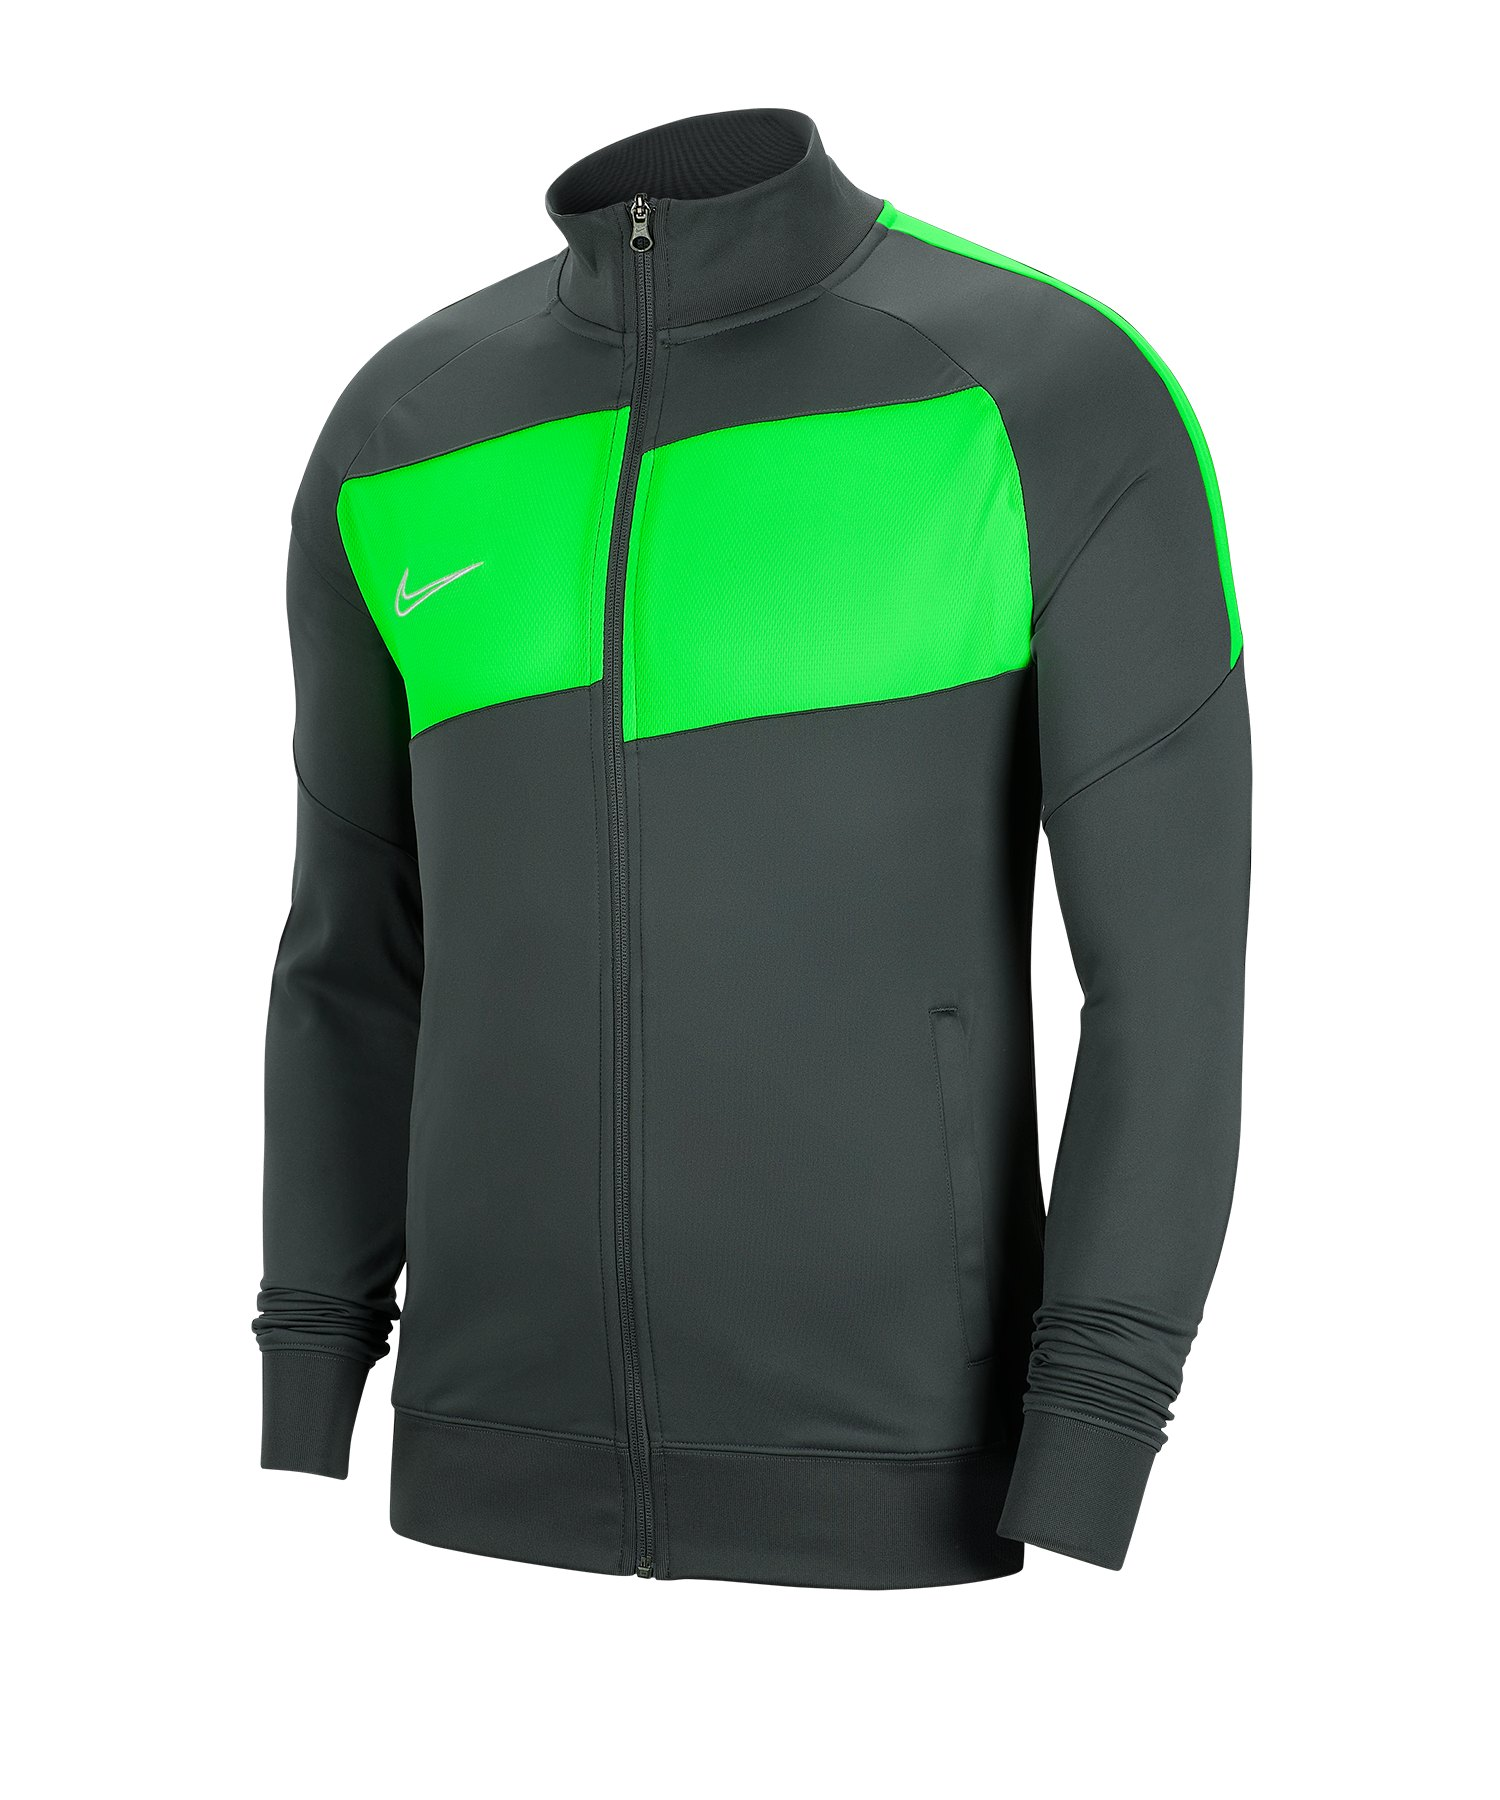 Nike Academy Pro Trainingsjacke Grau Grün F060 - grau